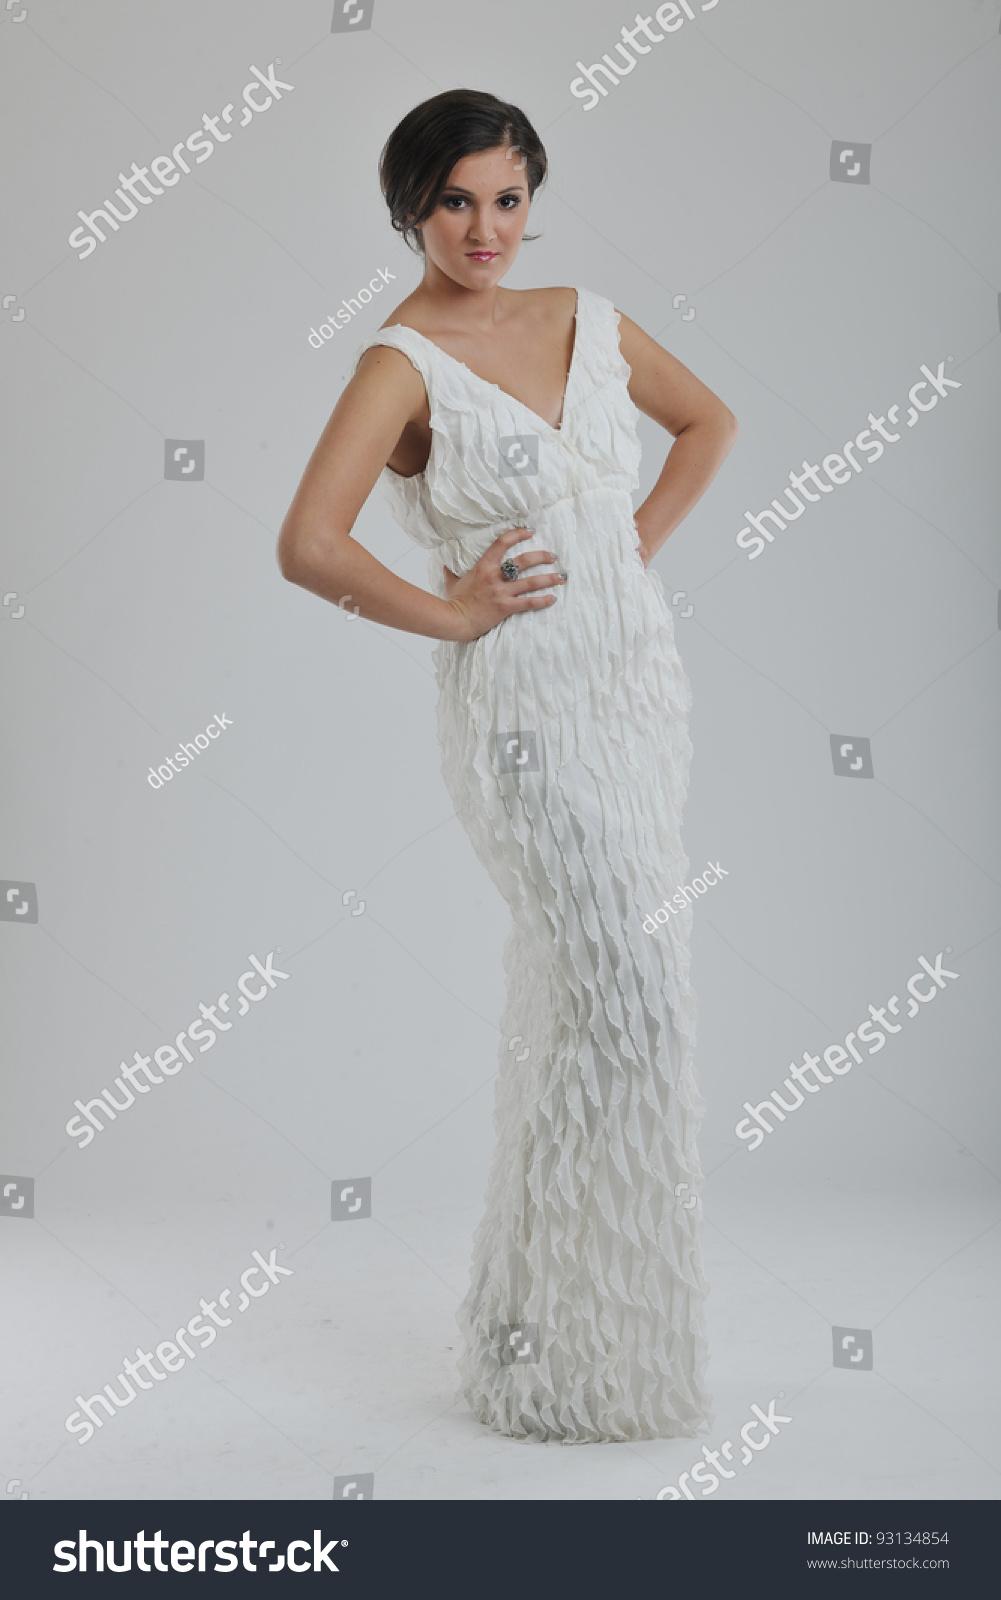 Beautiful Young Bride Wearing Wedding Dress Stock Photo 93134854 ...